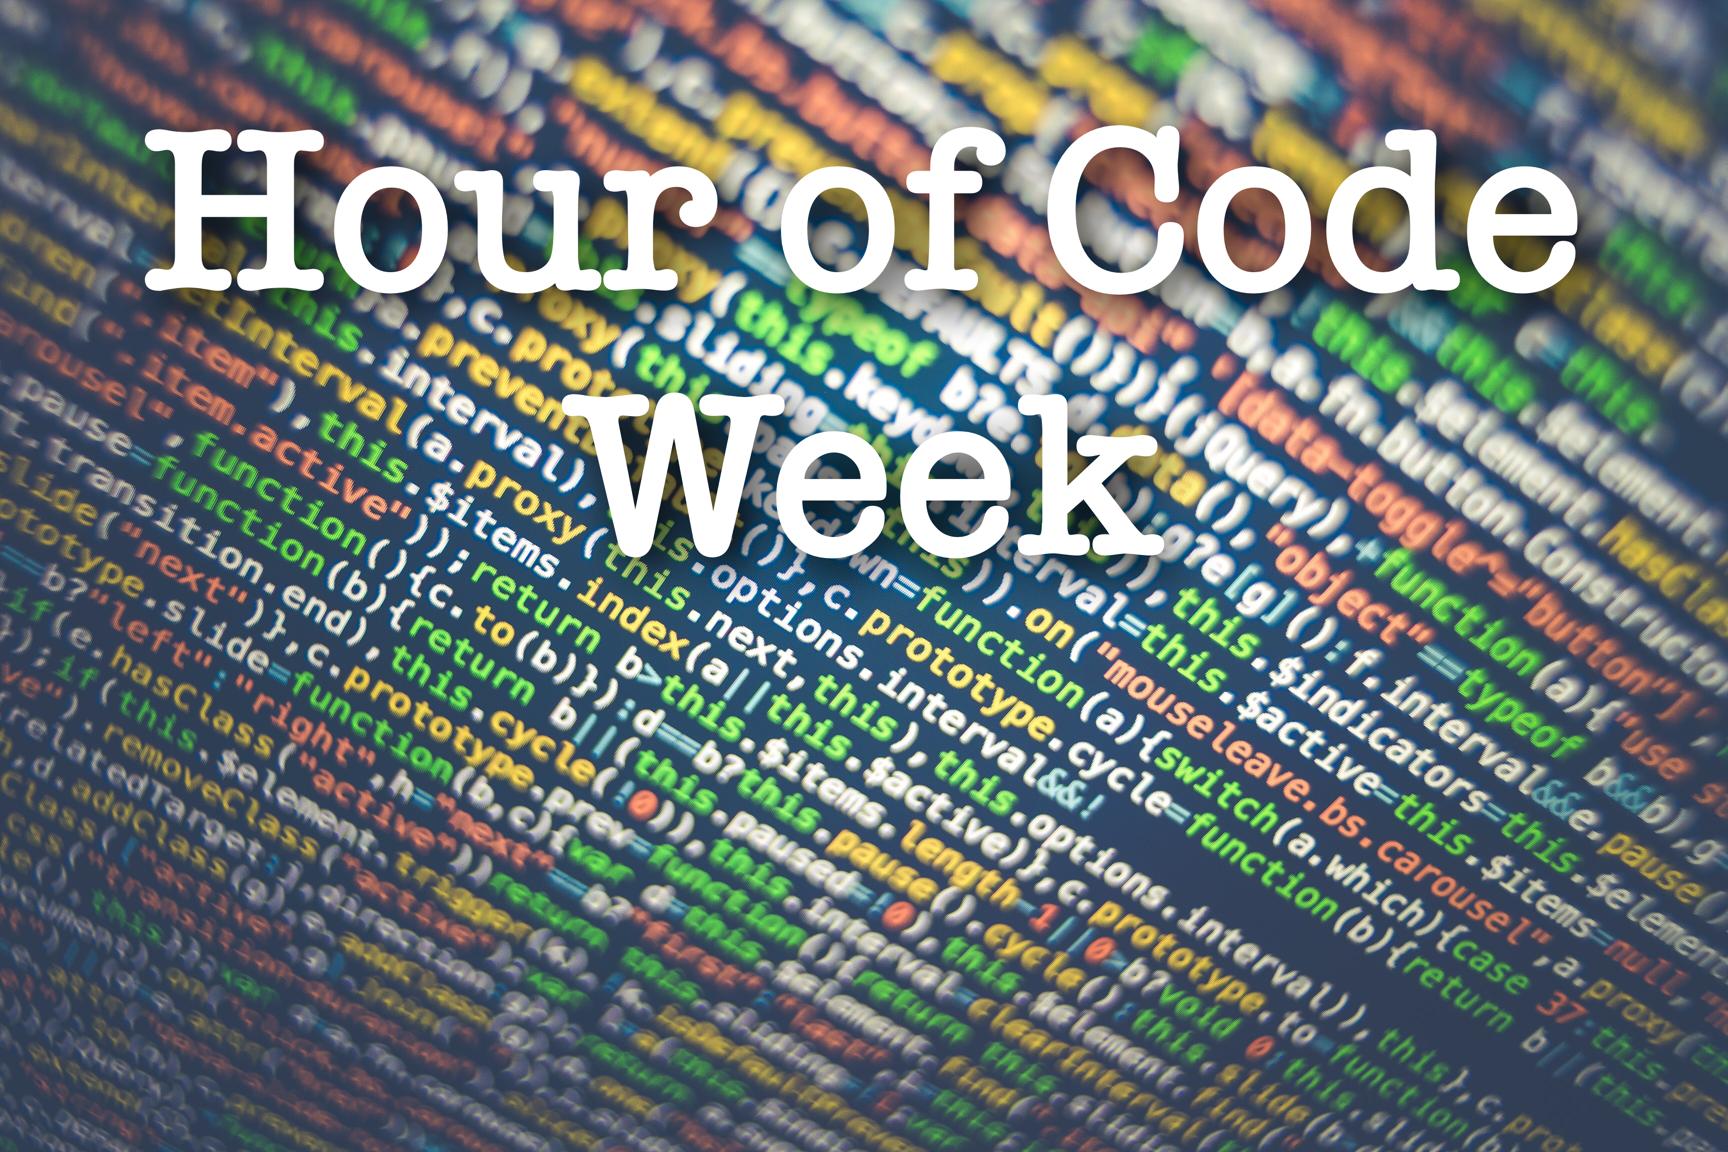 December 9-13 is Hour of Code Week at ATS